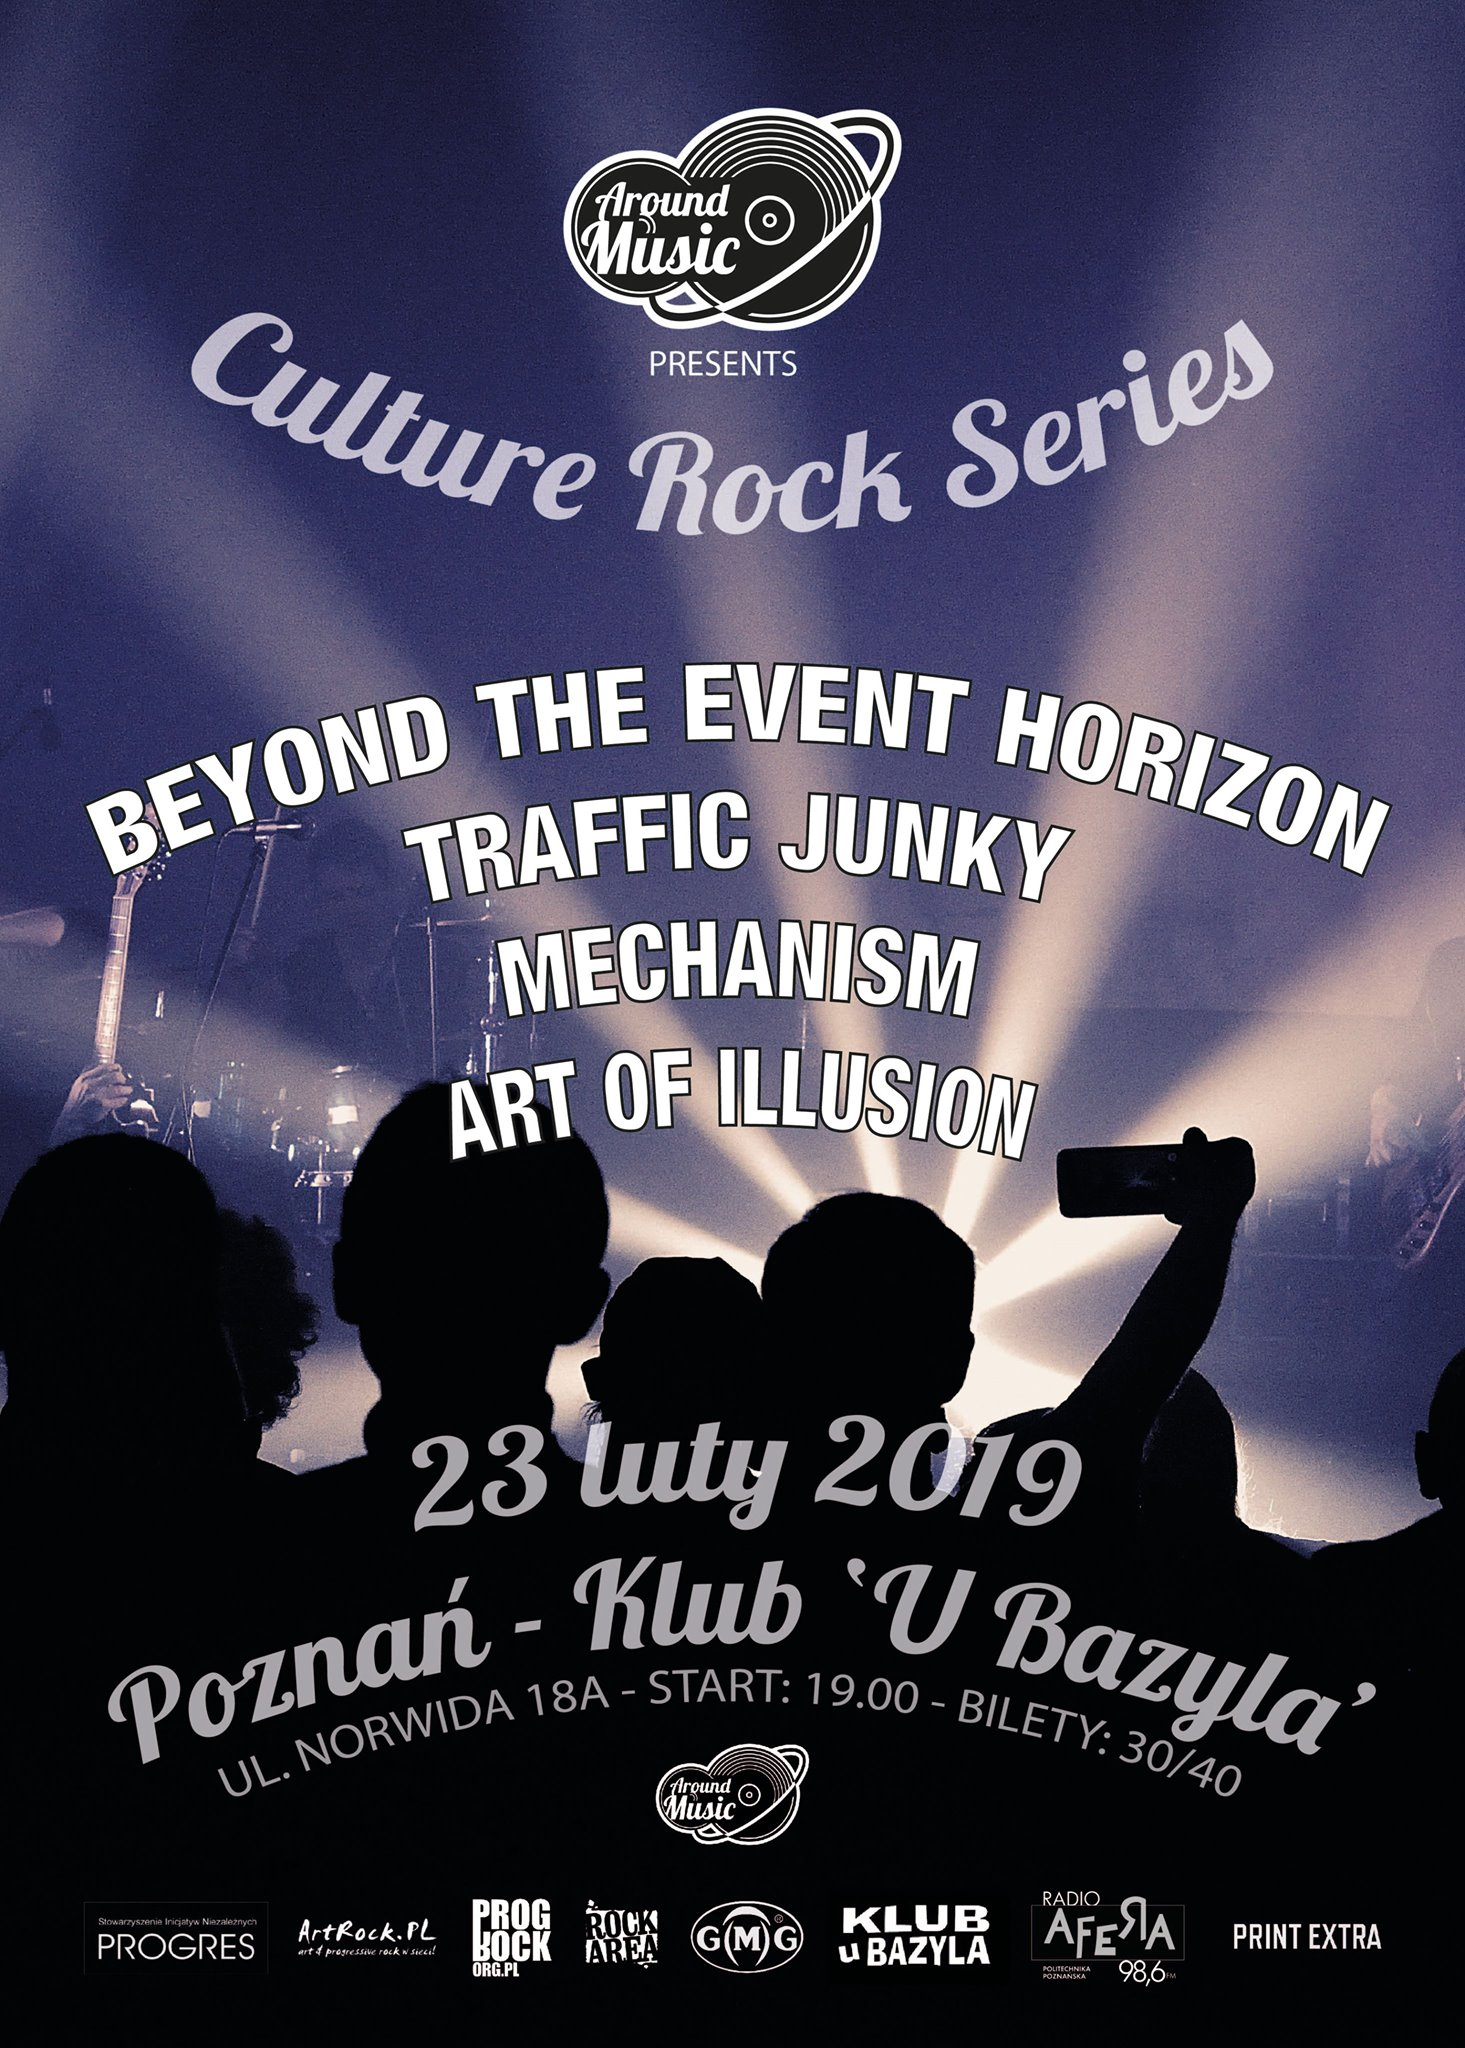 Culture Rock Series 2019